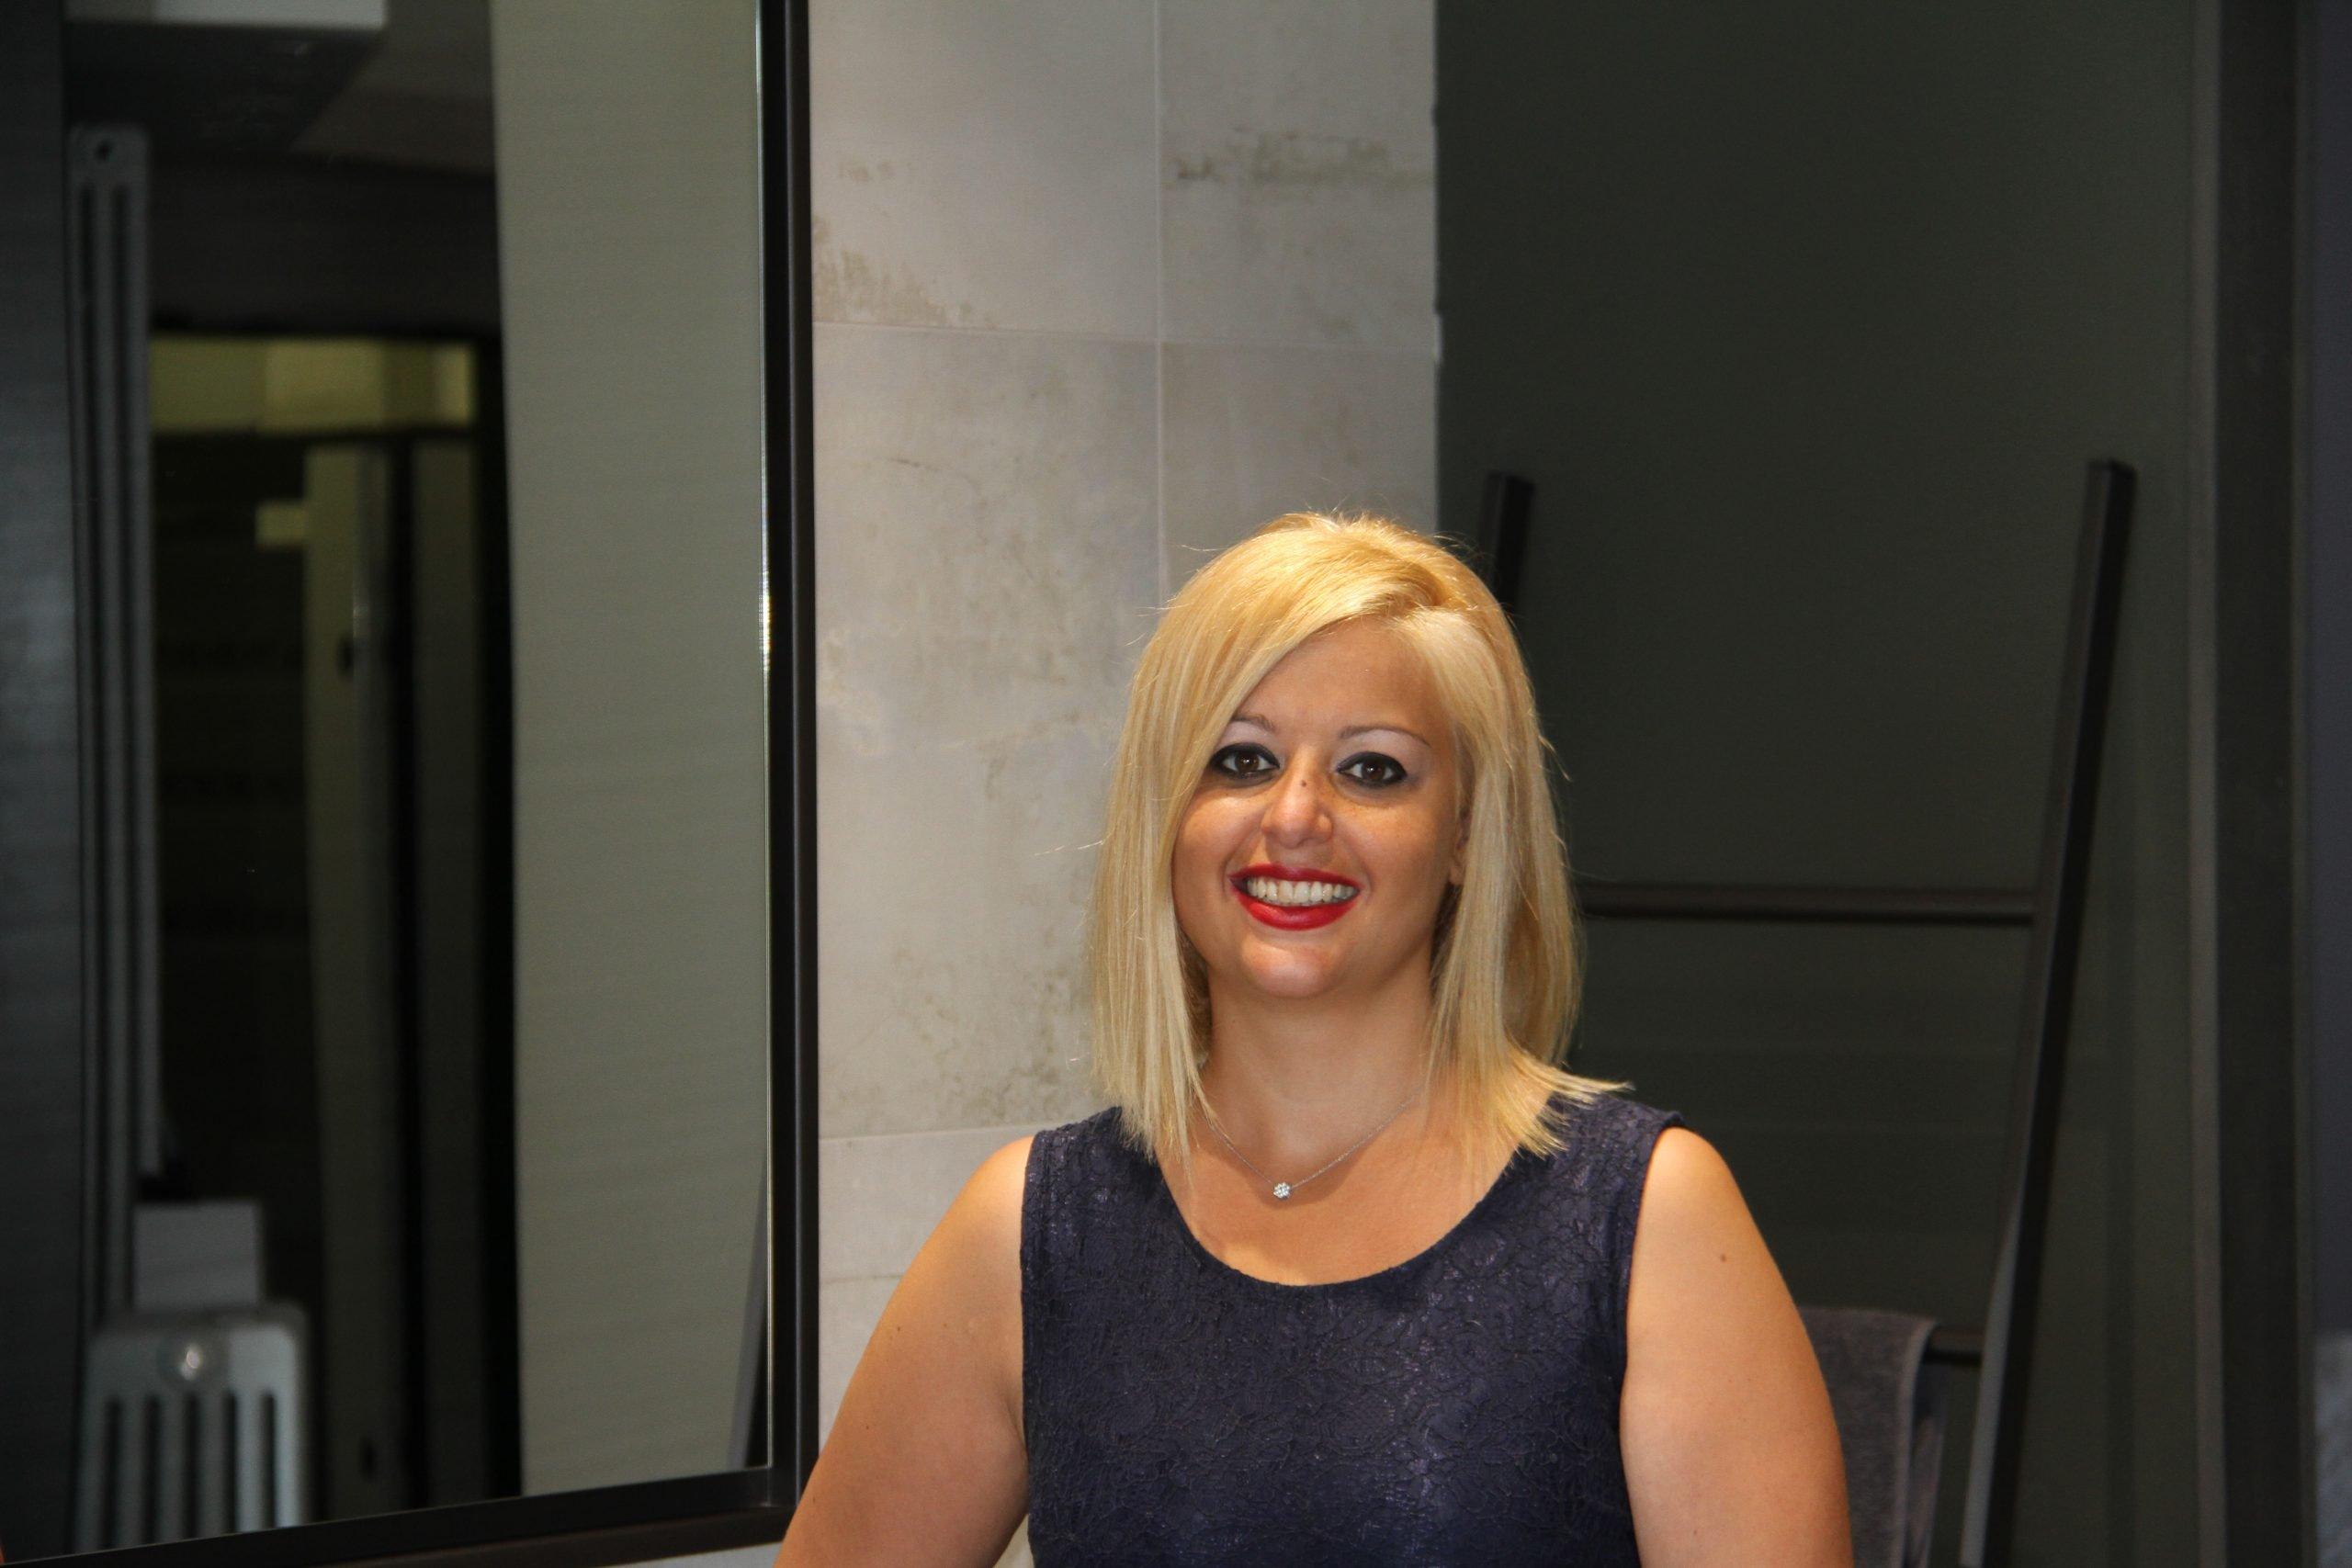 Isabella Borlotti